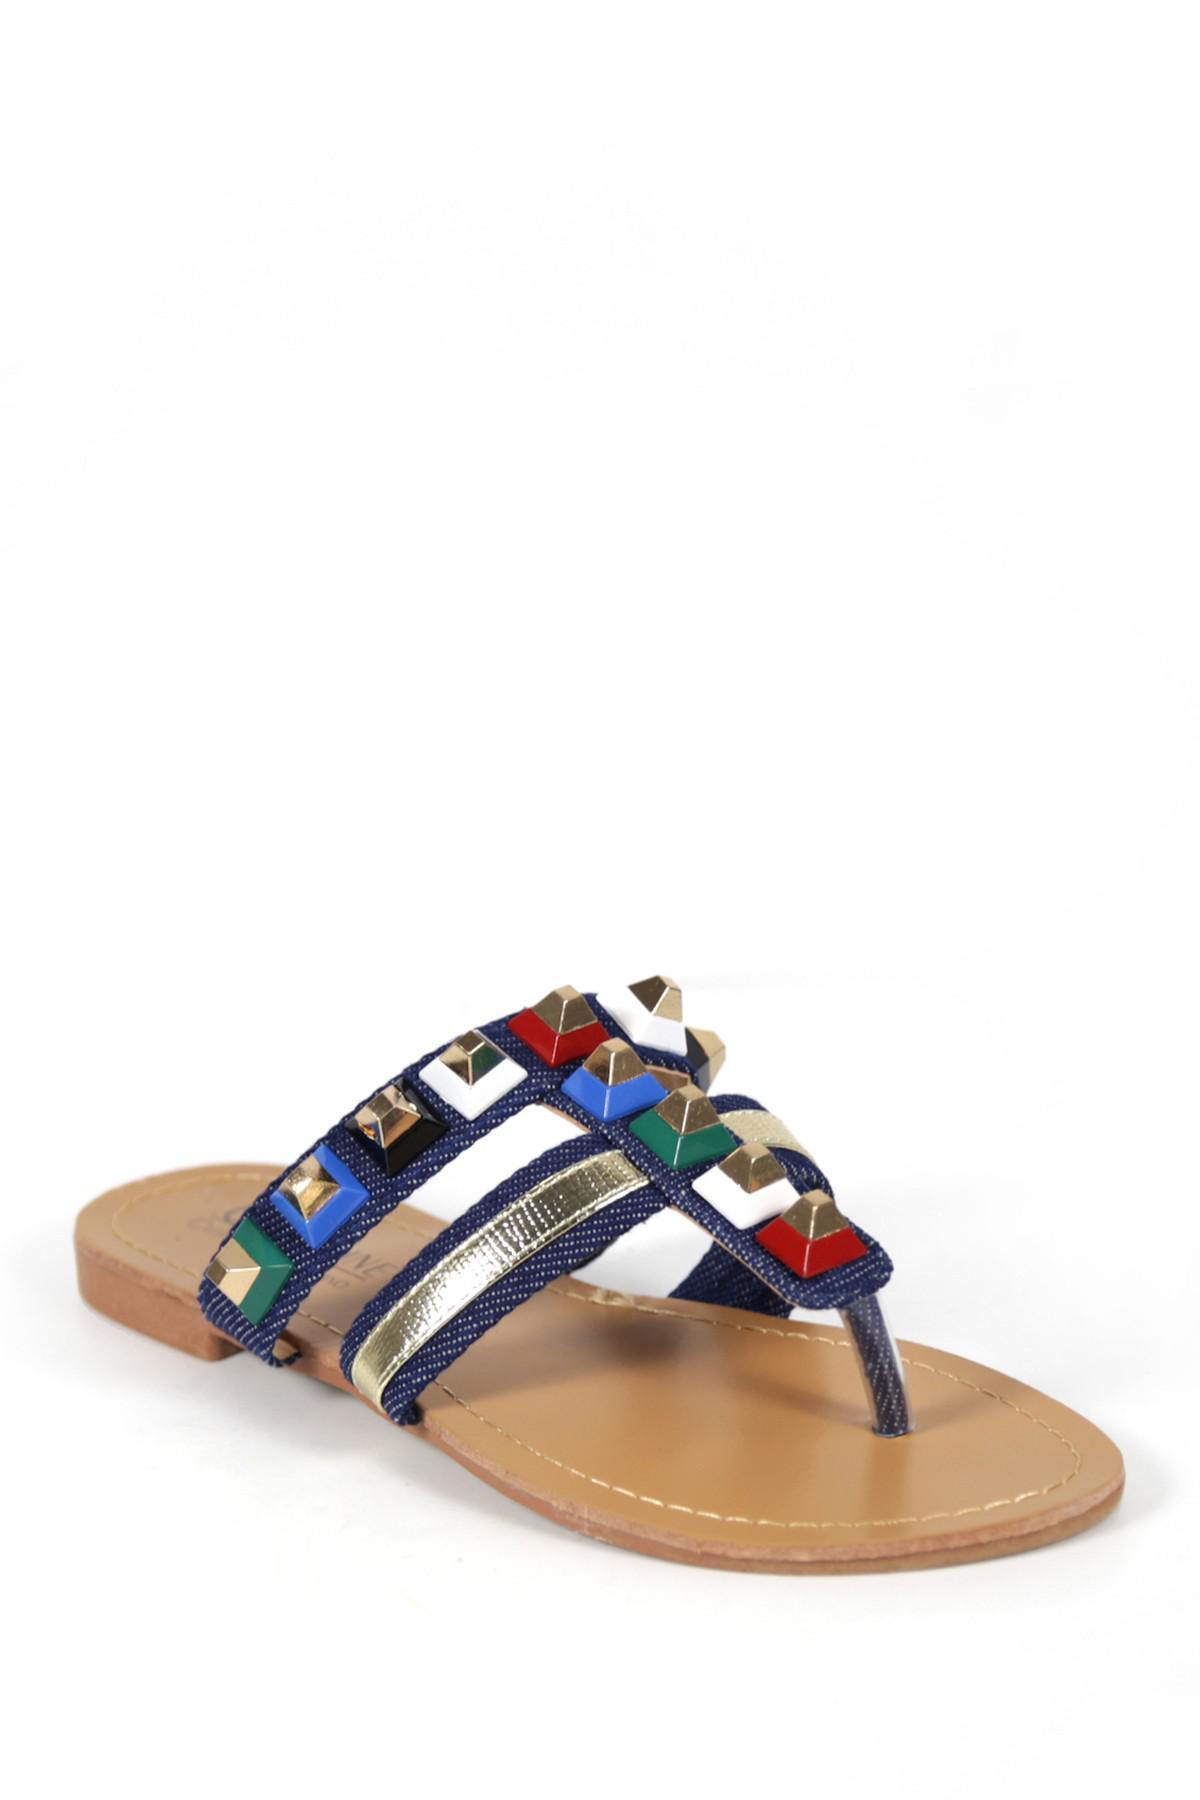 Catherine Catherine Malandrino Pyramis Studded Thong Sandal 6VpvRJf